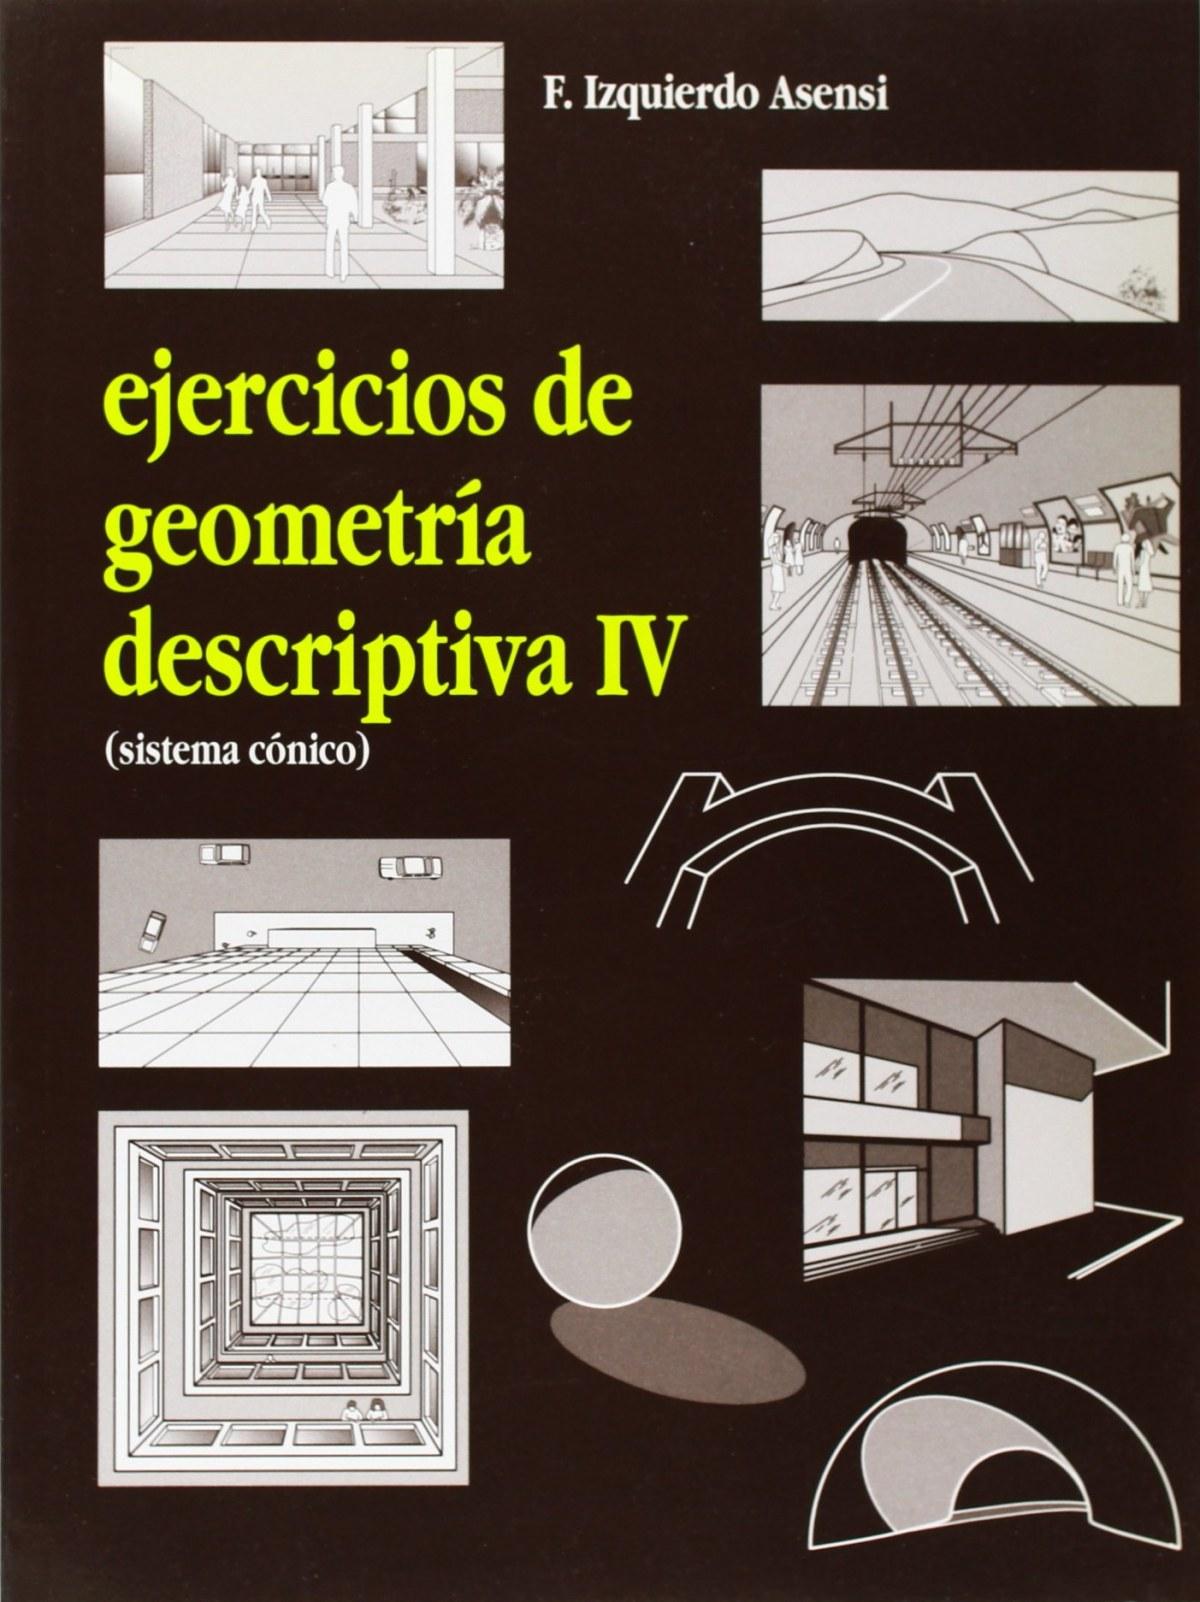 Ejercicios geometria descriptiva